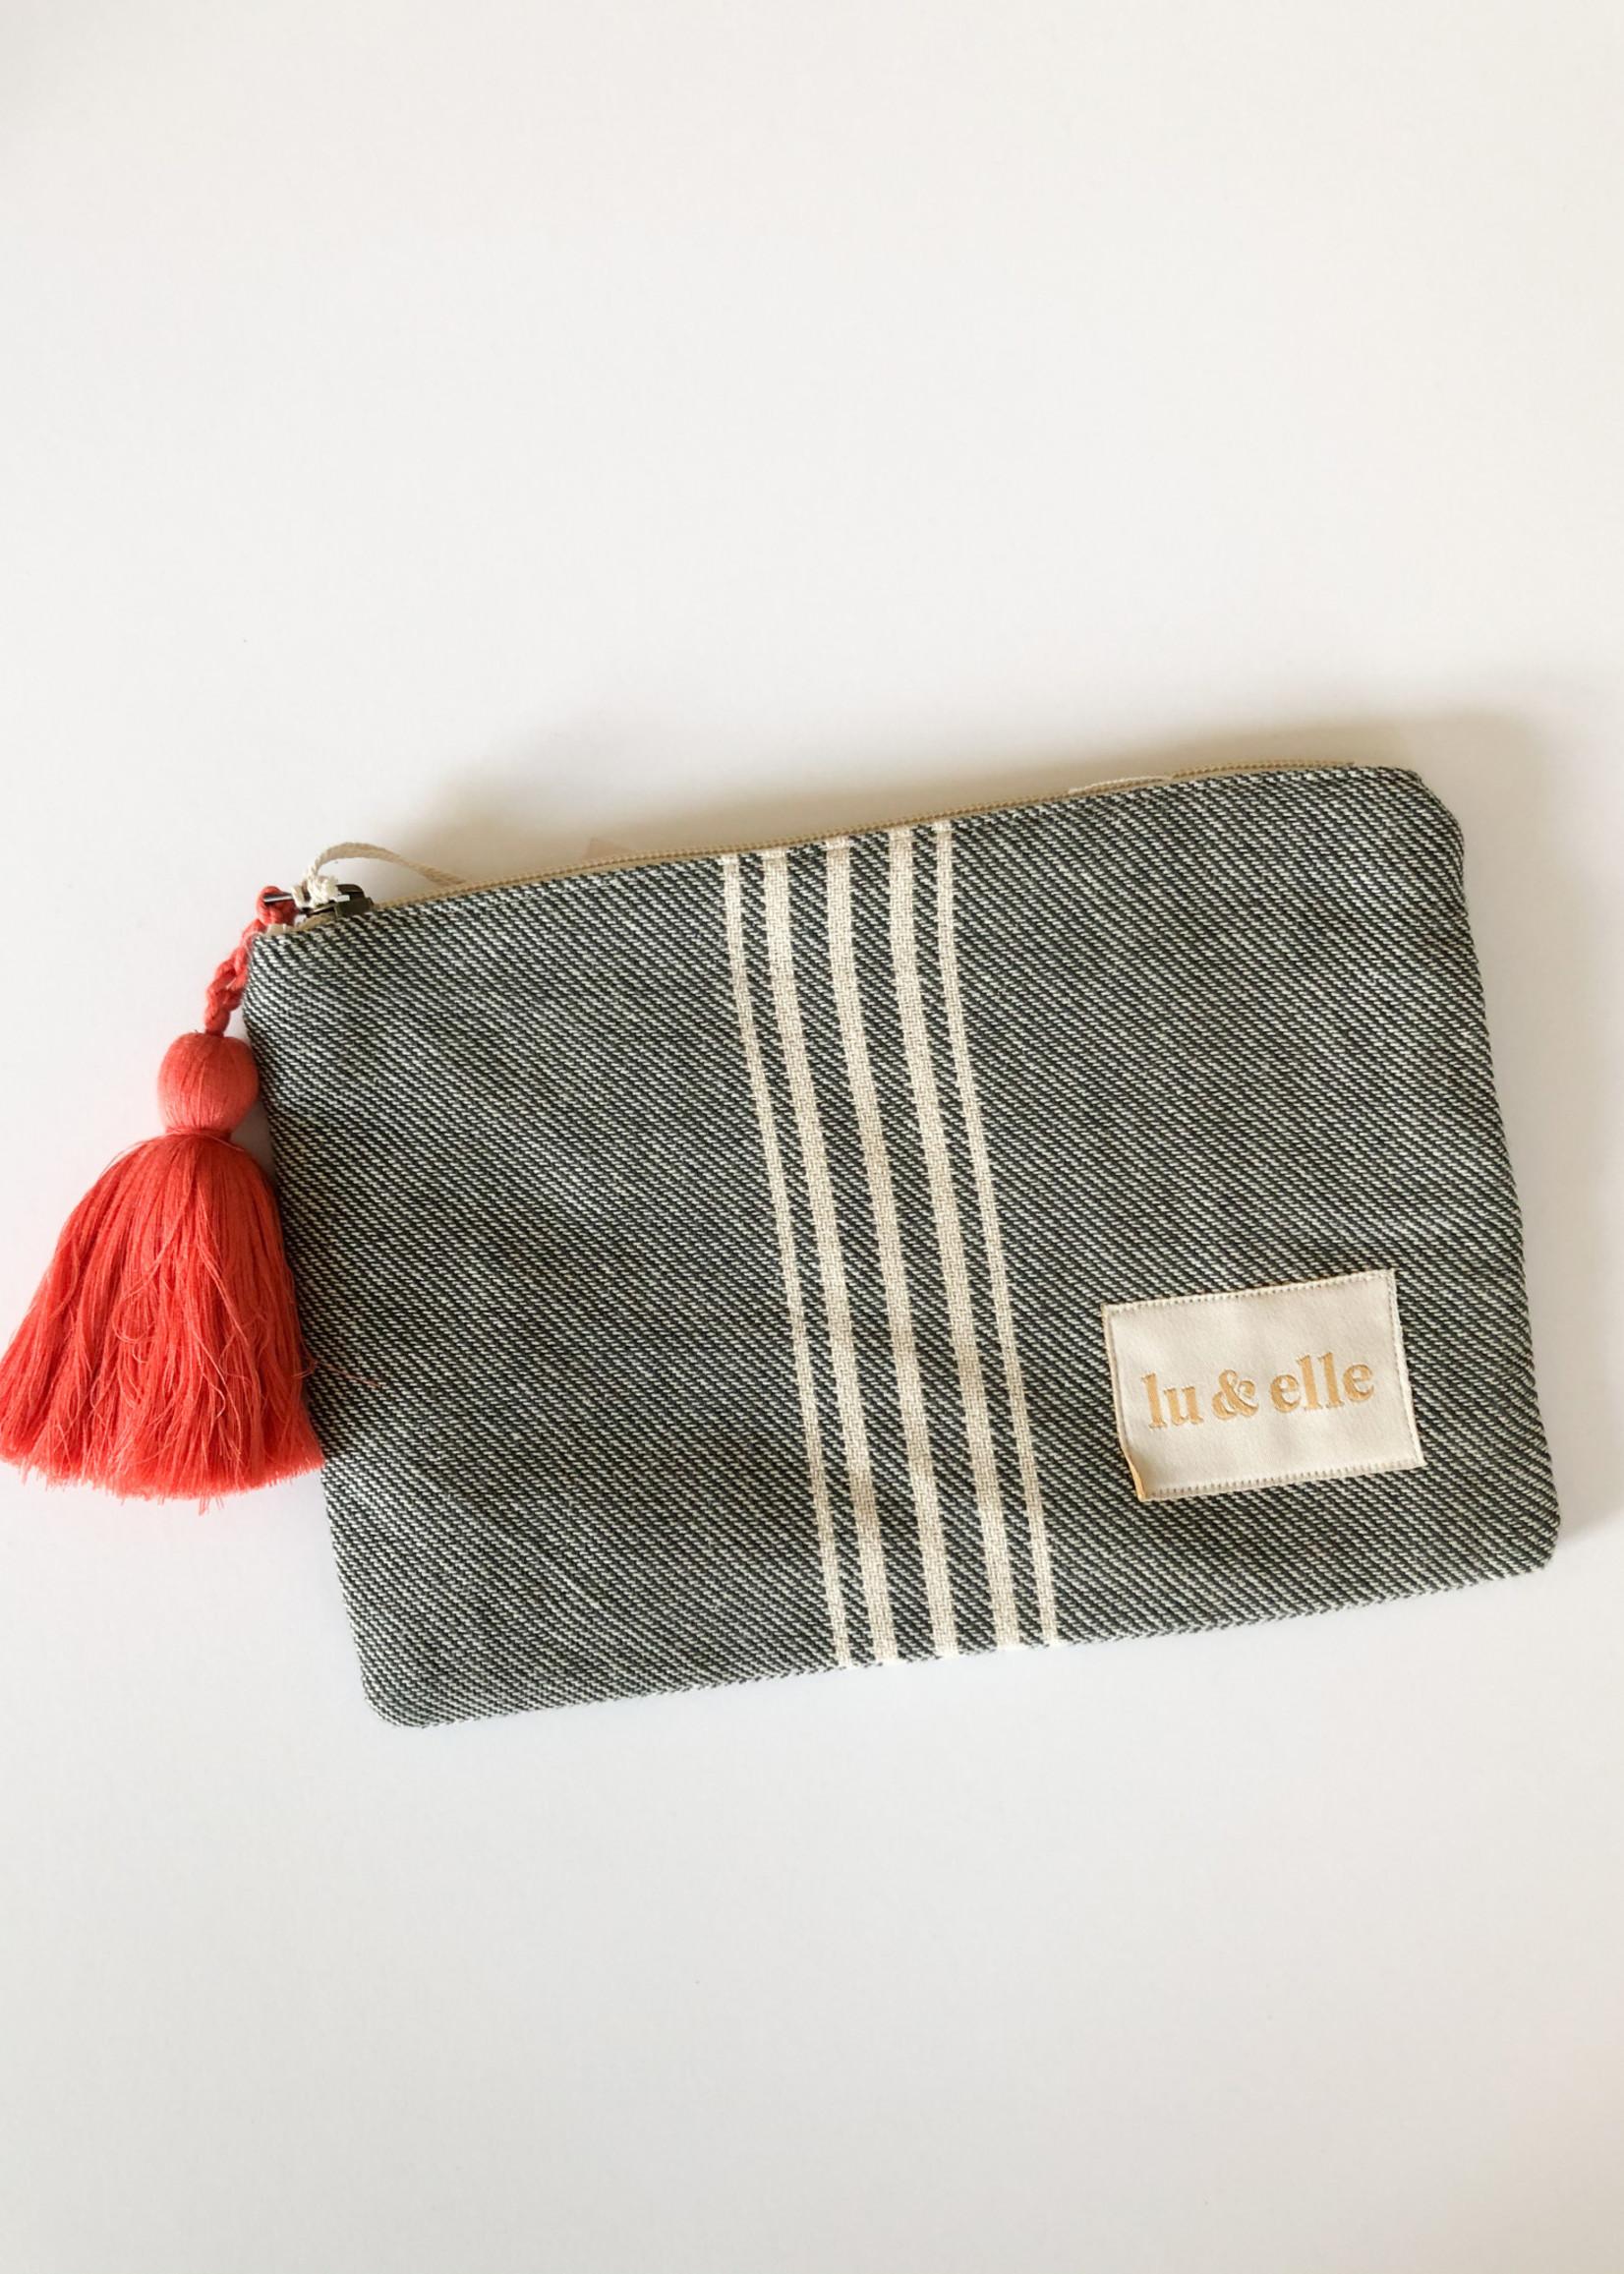 Lu & Elle Classic Stripe Pouch